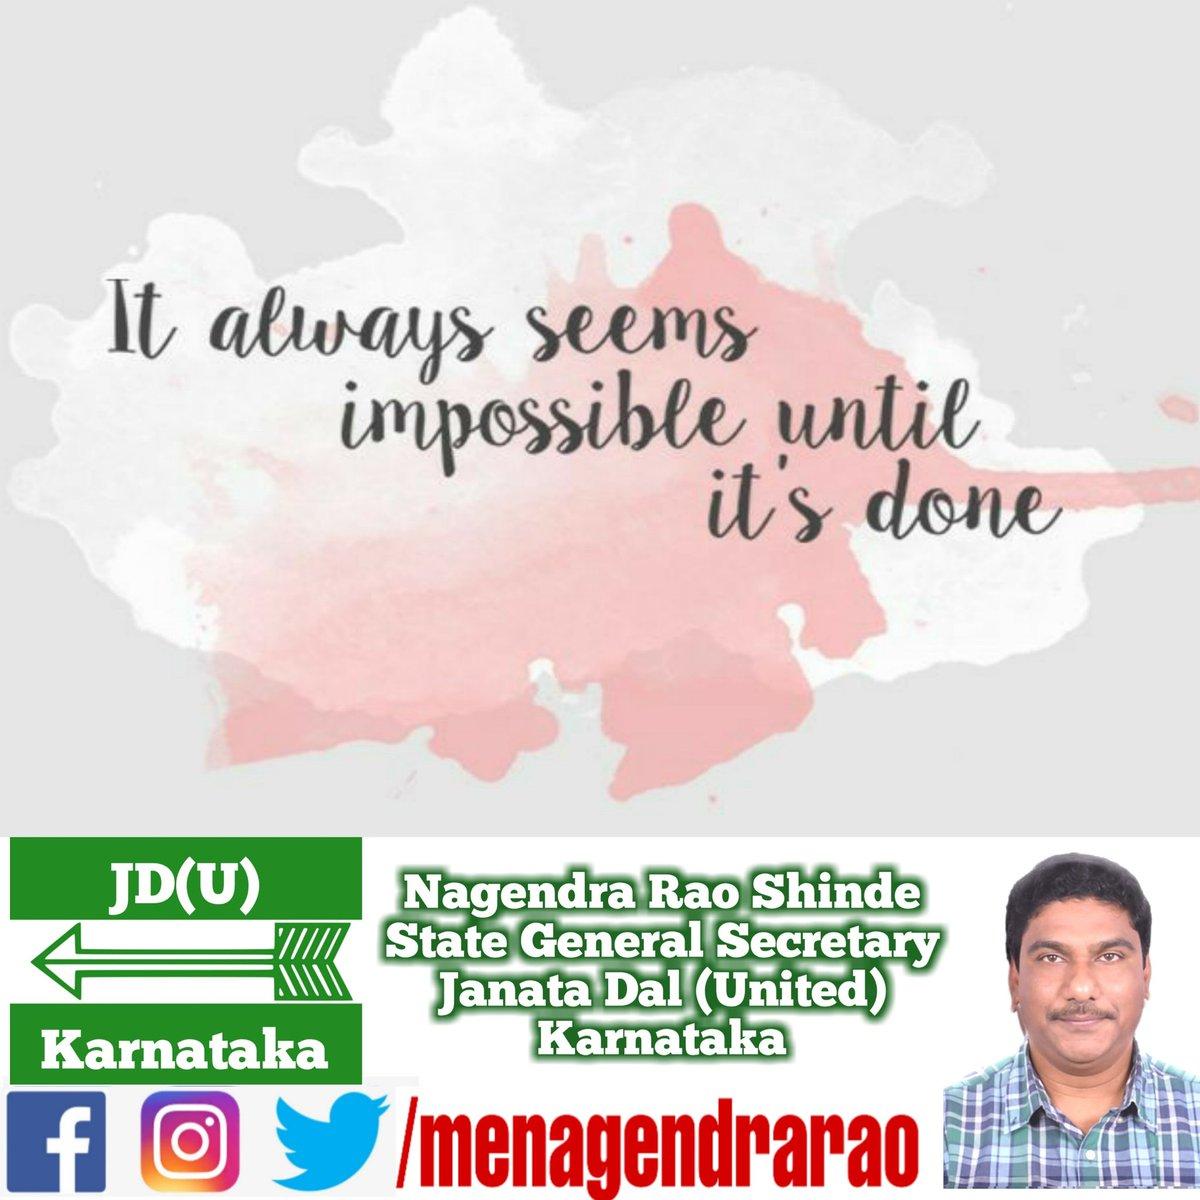 #MondayMotivation #JDU #Karnataka @gsecretaryjdu @NitishKumar @PrashantKishor @afaquejdu @RCP_Singh @SanjayJhaBihar @JDU_India @Jduonline @KCTyagiJDU @sanjaykumarjdu https://t.co/3ksNdrGXm2